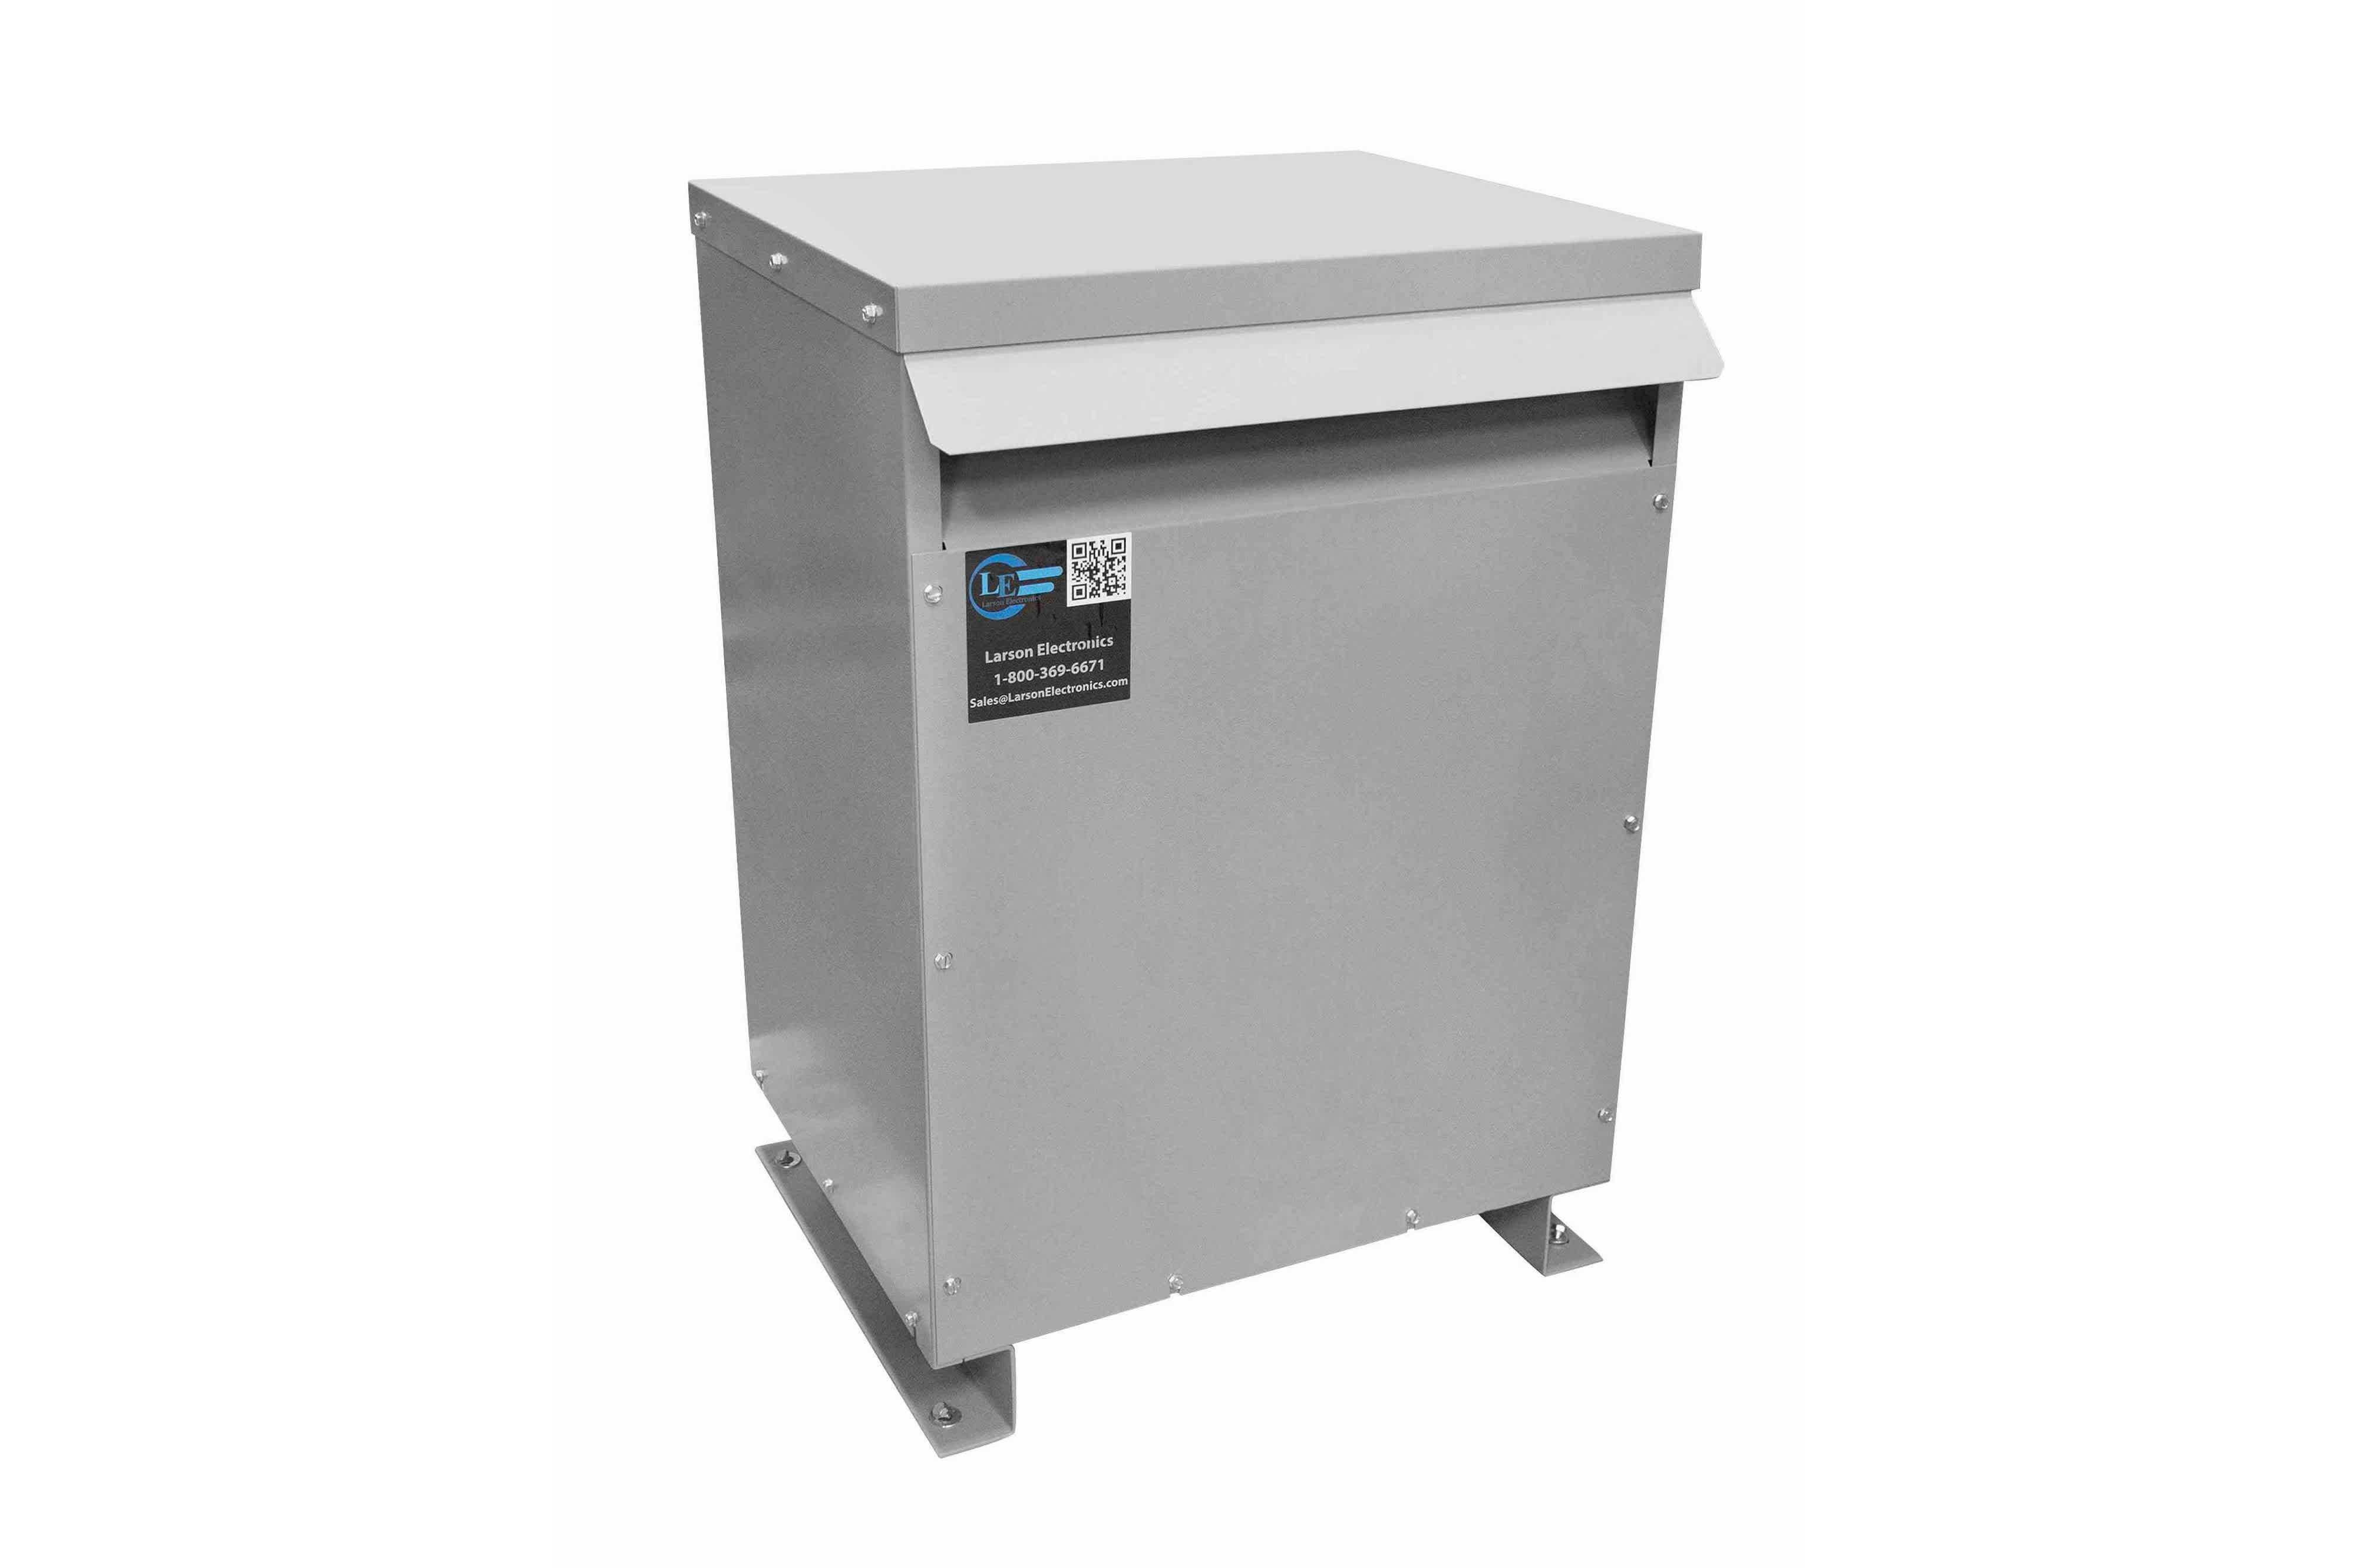 26 kVA 3PH Isolation Transformer, 575V Wye Primary, 415V Delta Secondary, N3R, Ventilated, 60 Hz